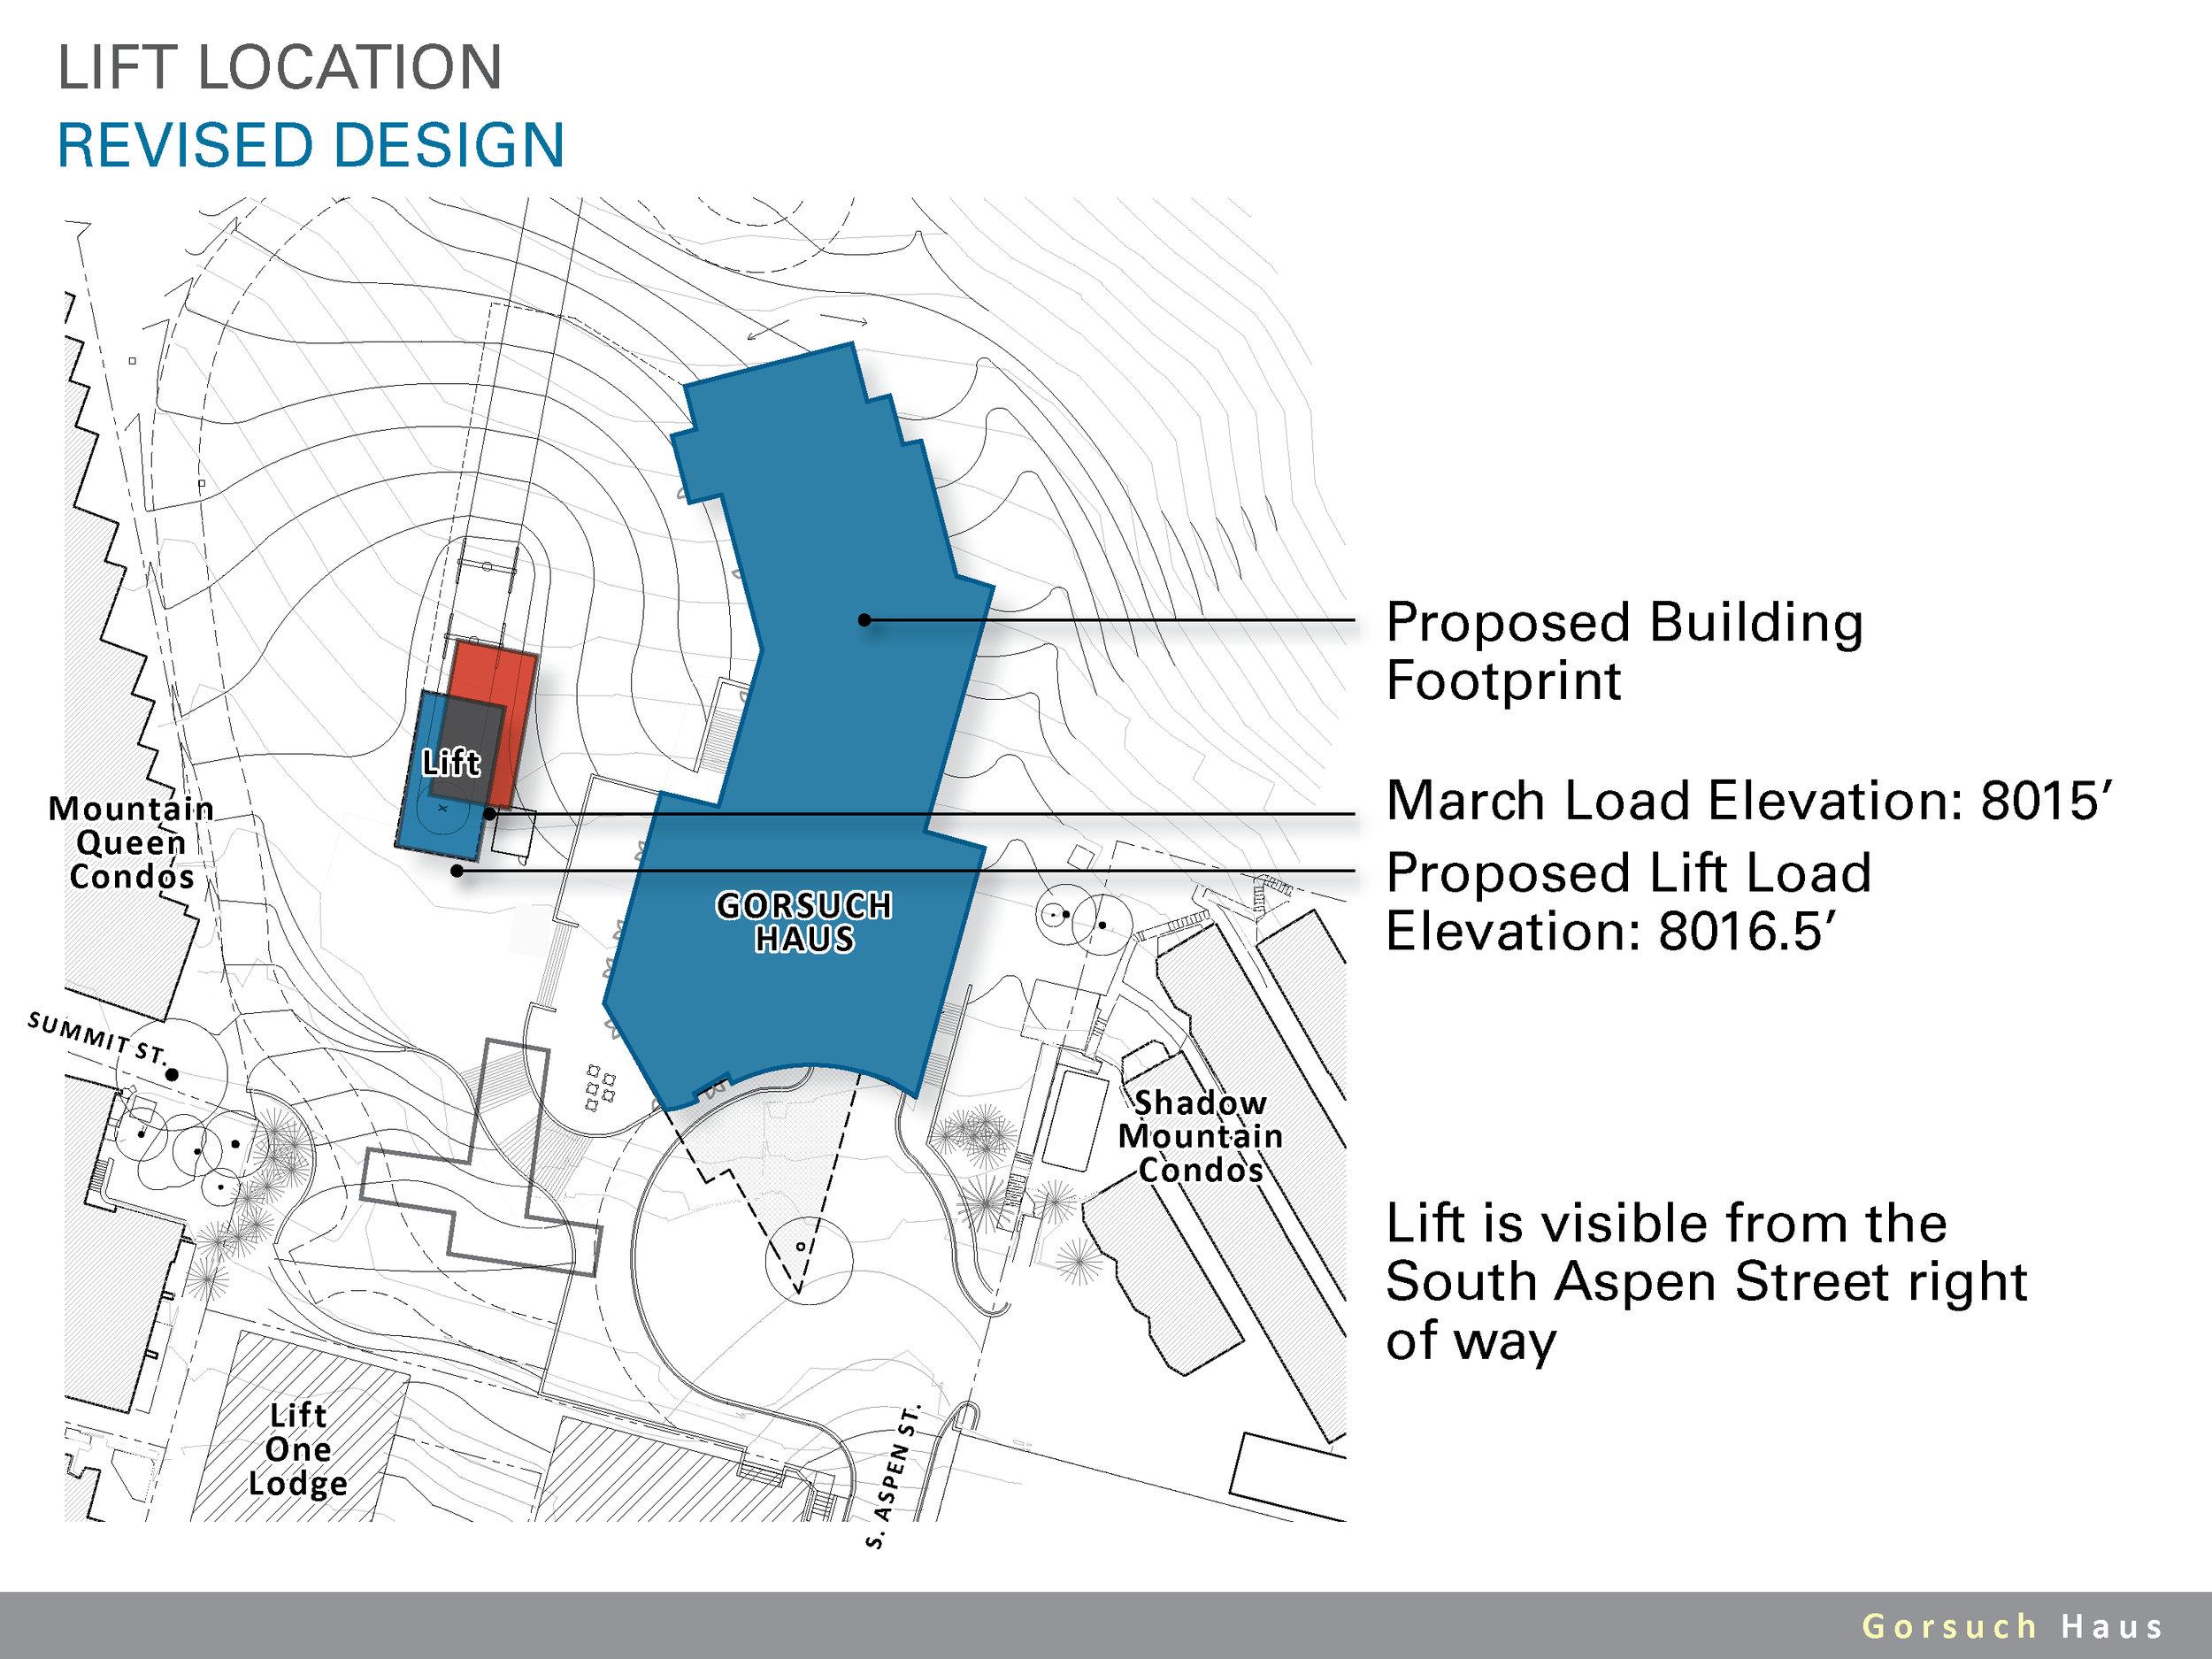 160816_P&ZHearing3 Lift Location Revised - Slides7.jpg